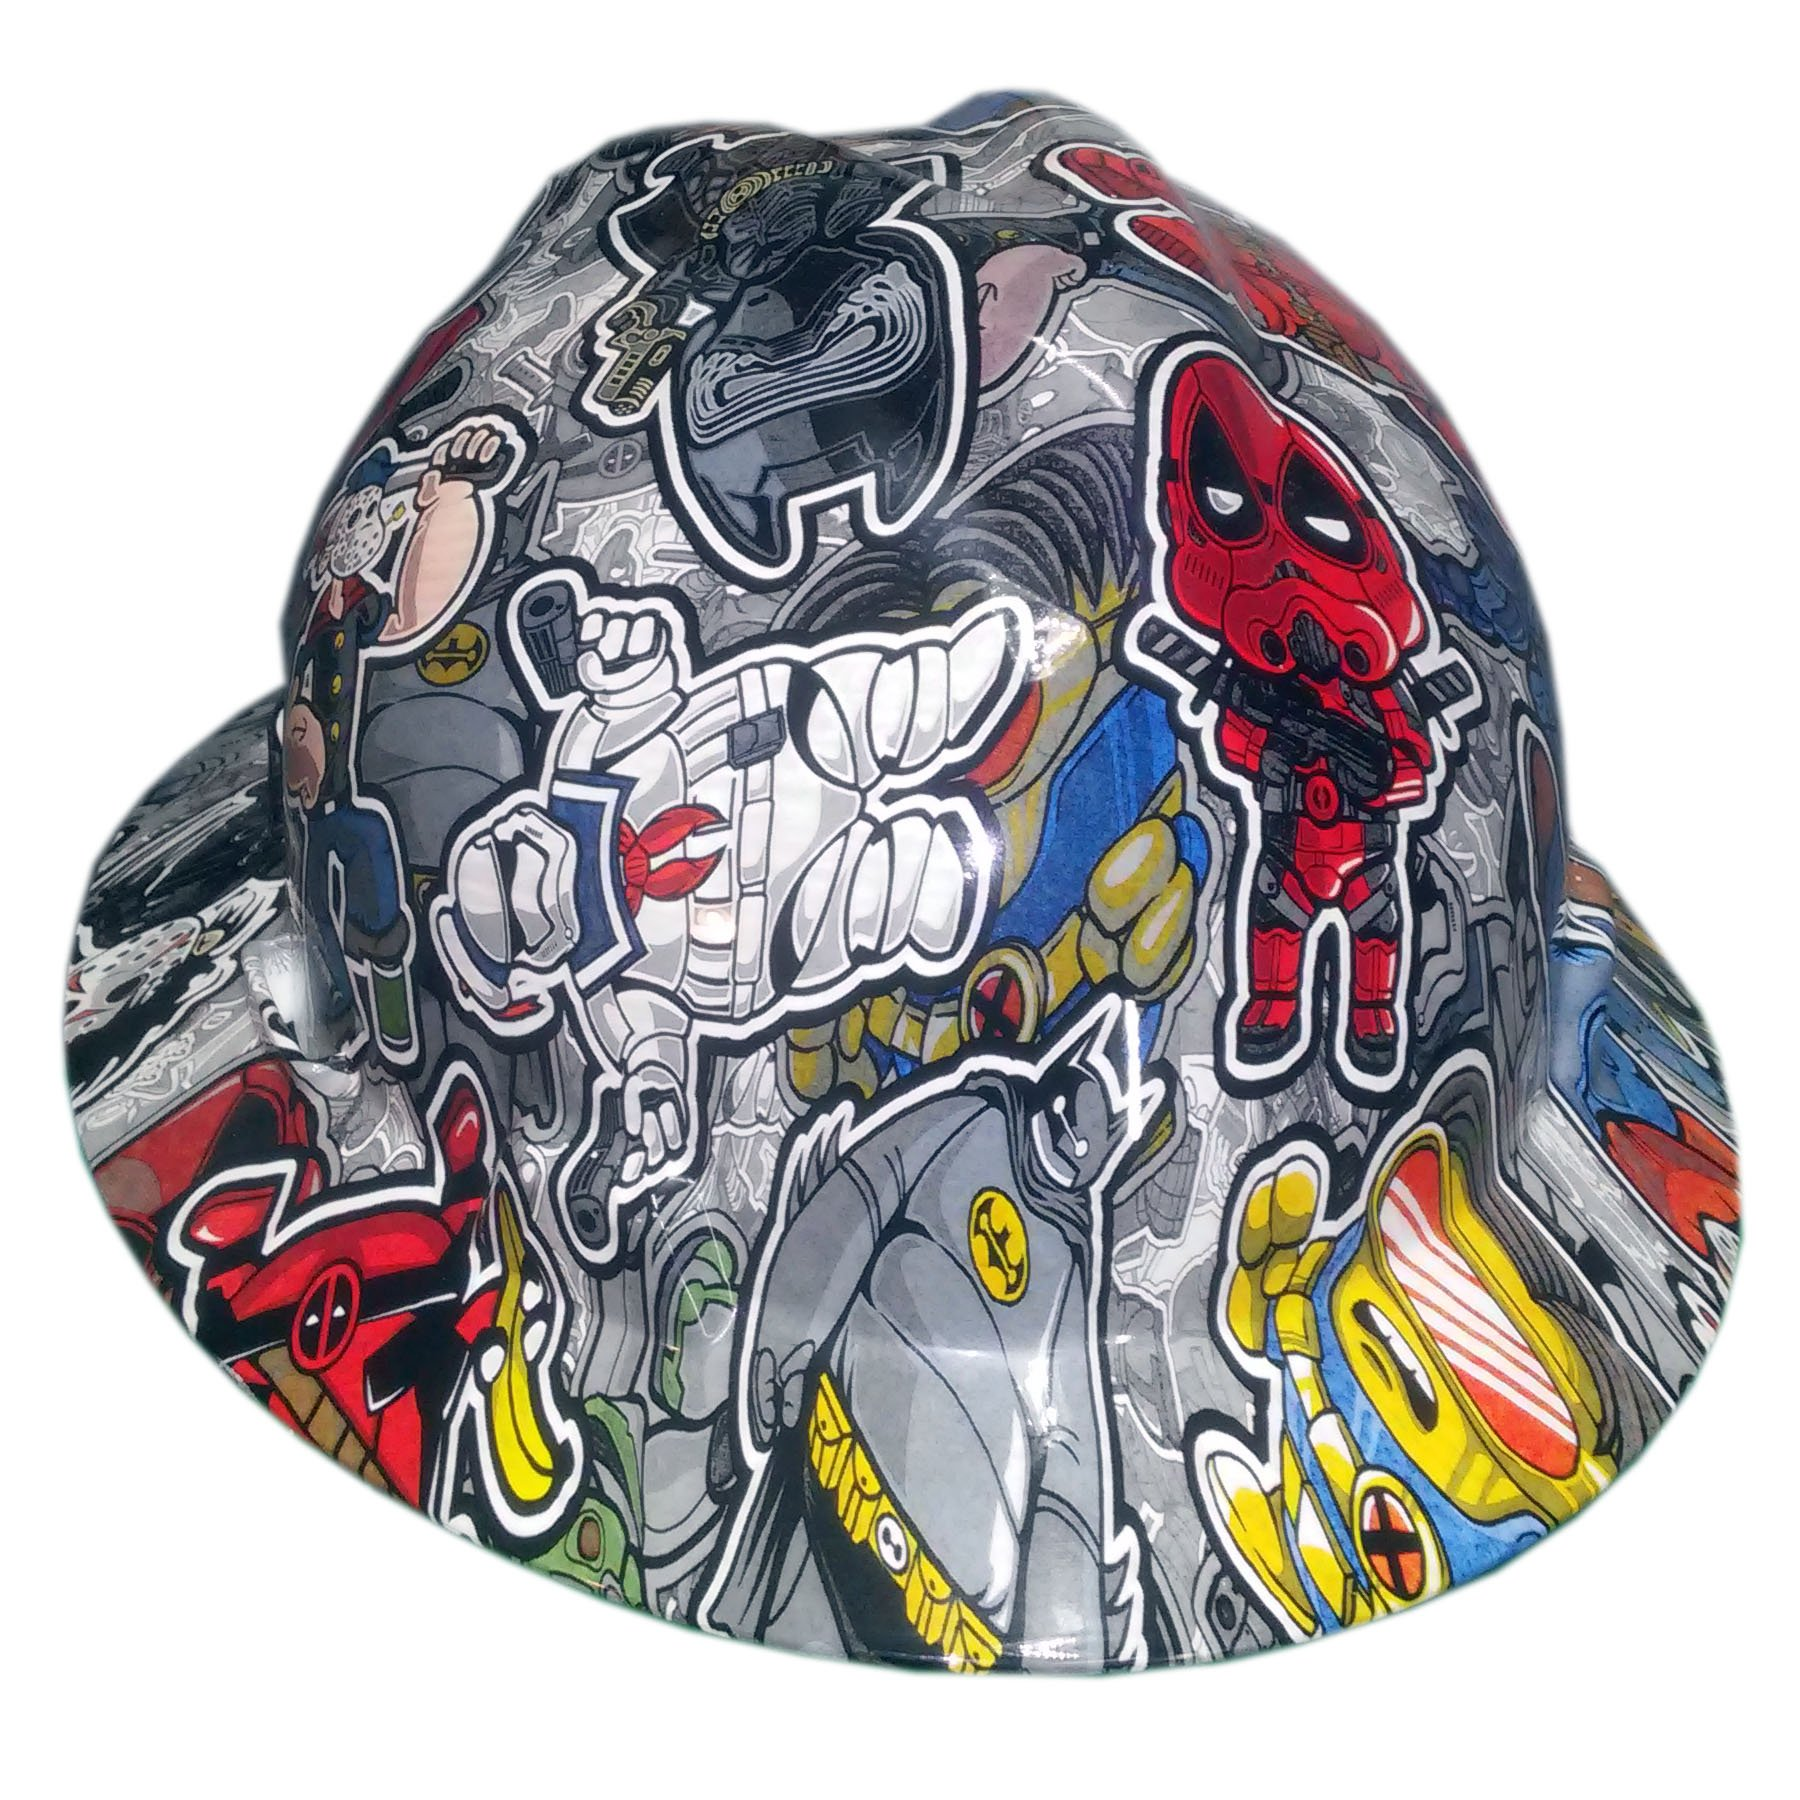 Izzo Graphics Twisted Toons MSA V-Guard Full Brim Hard Hat